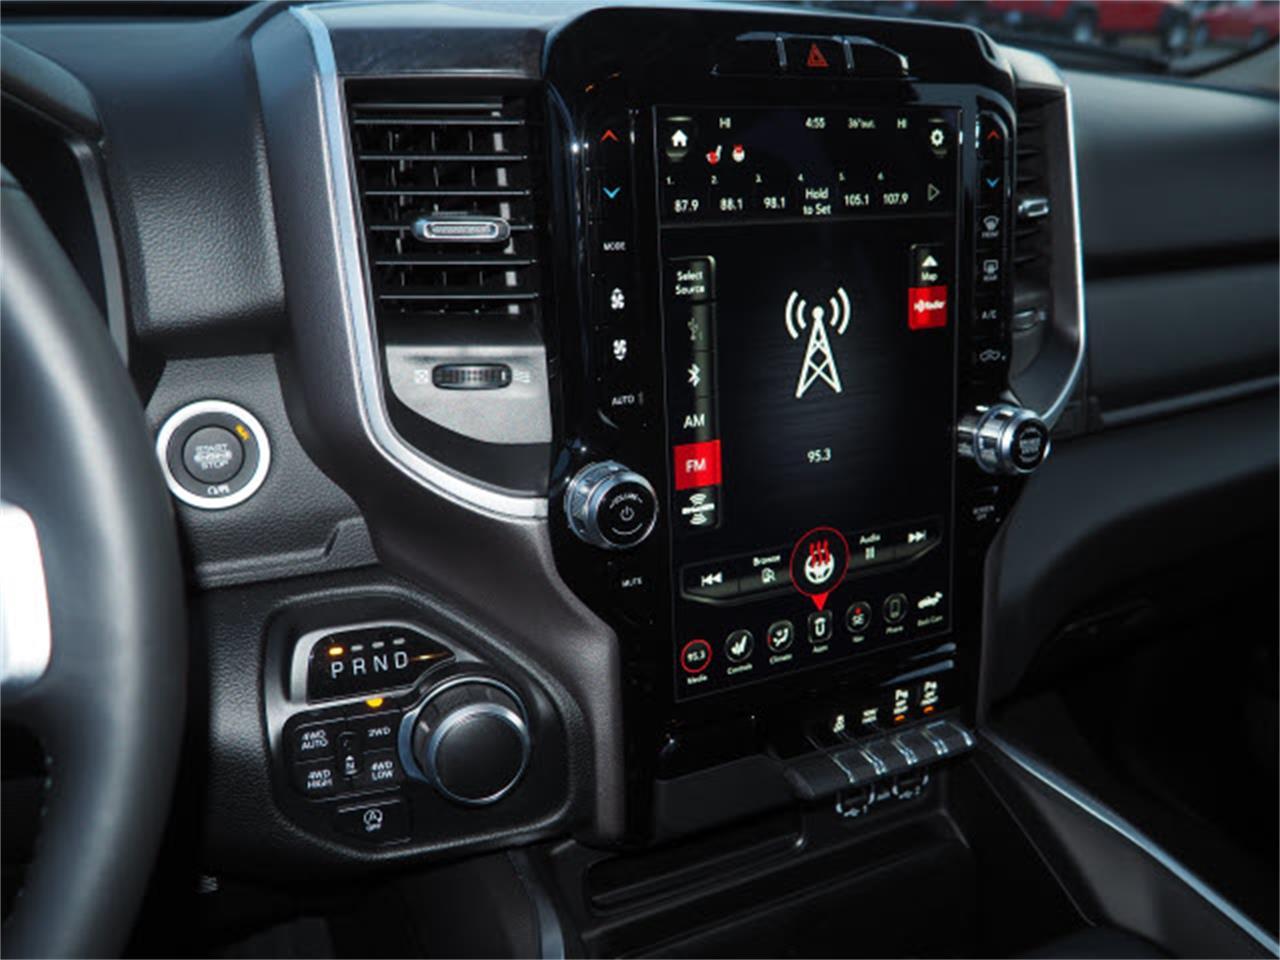 2020 Dodge Ram 1500 (CC-1327572) for sale in Marysville, Ohio